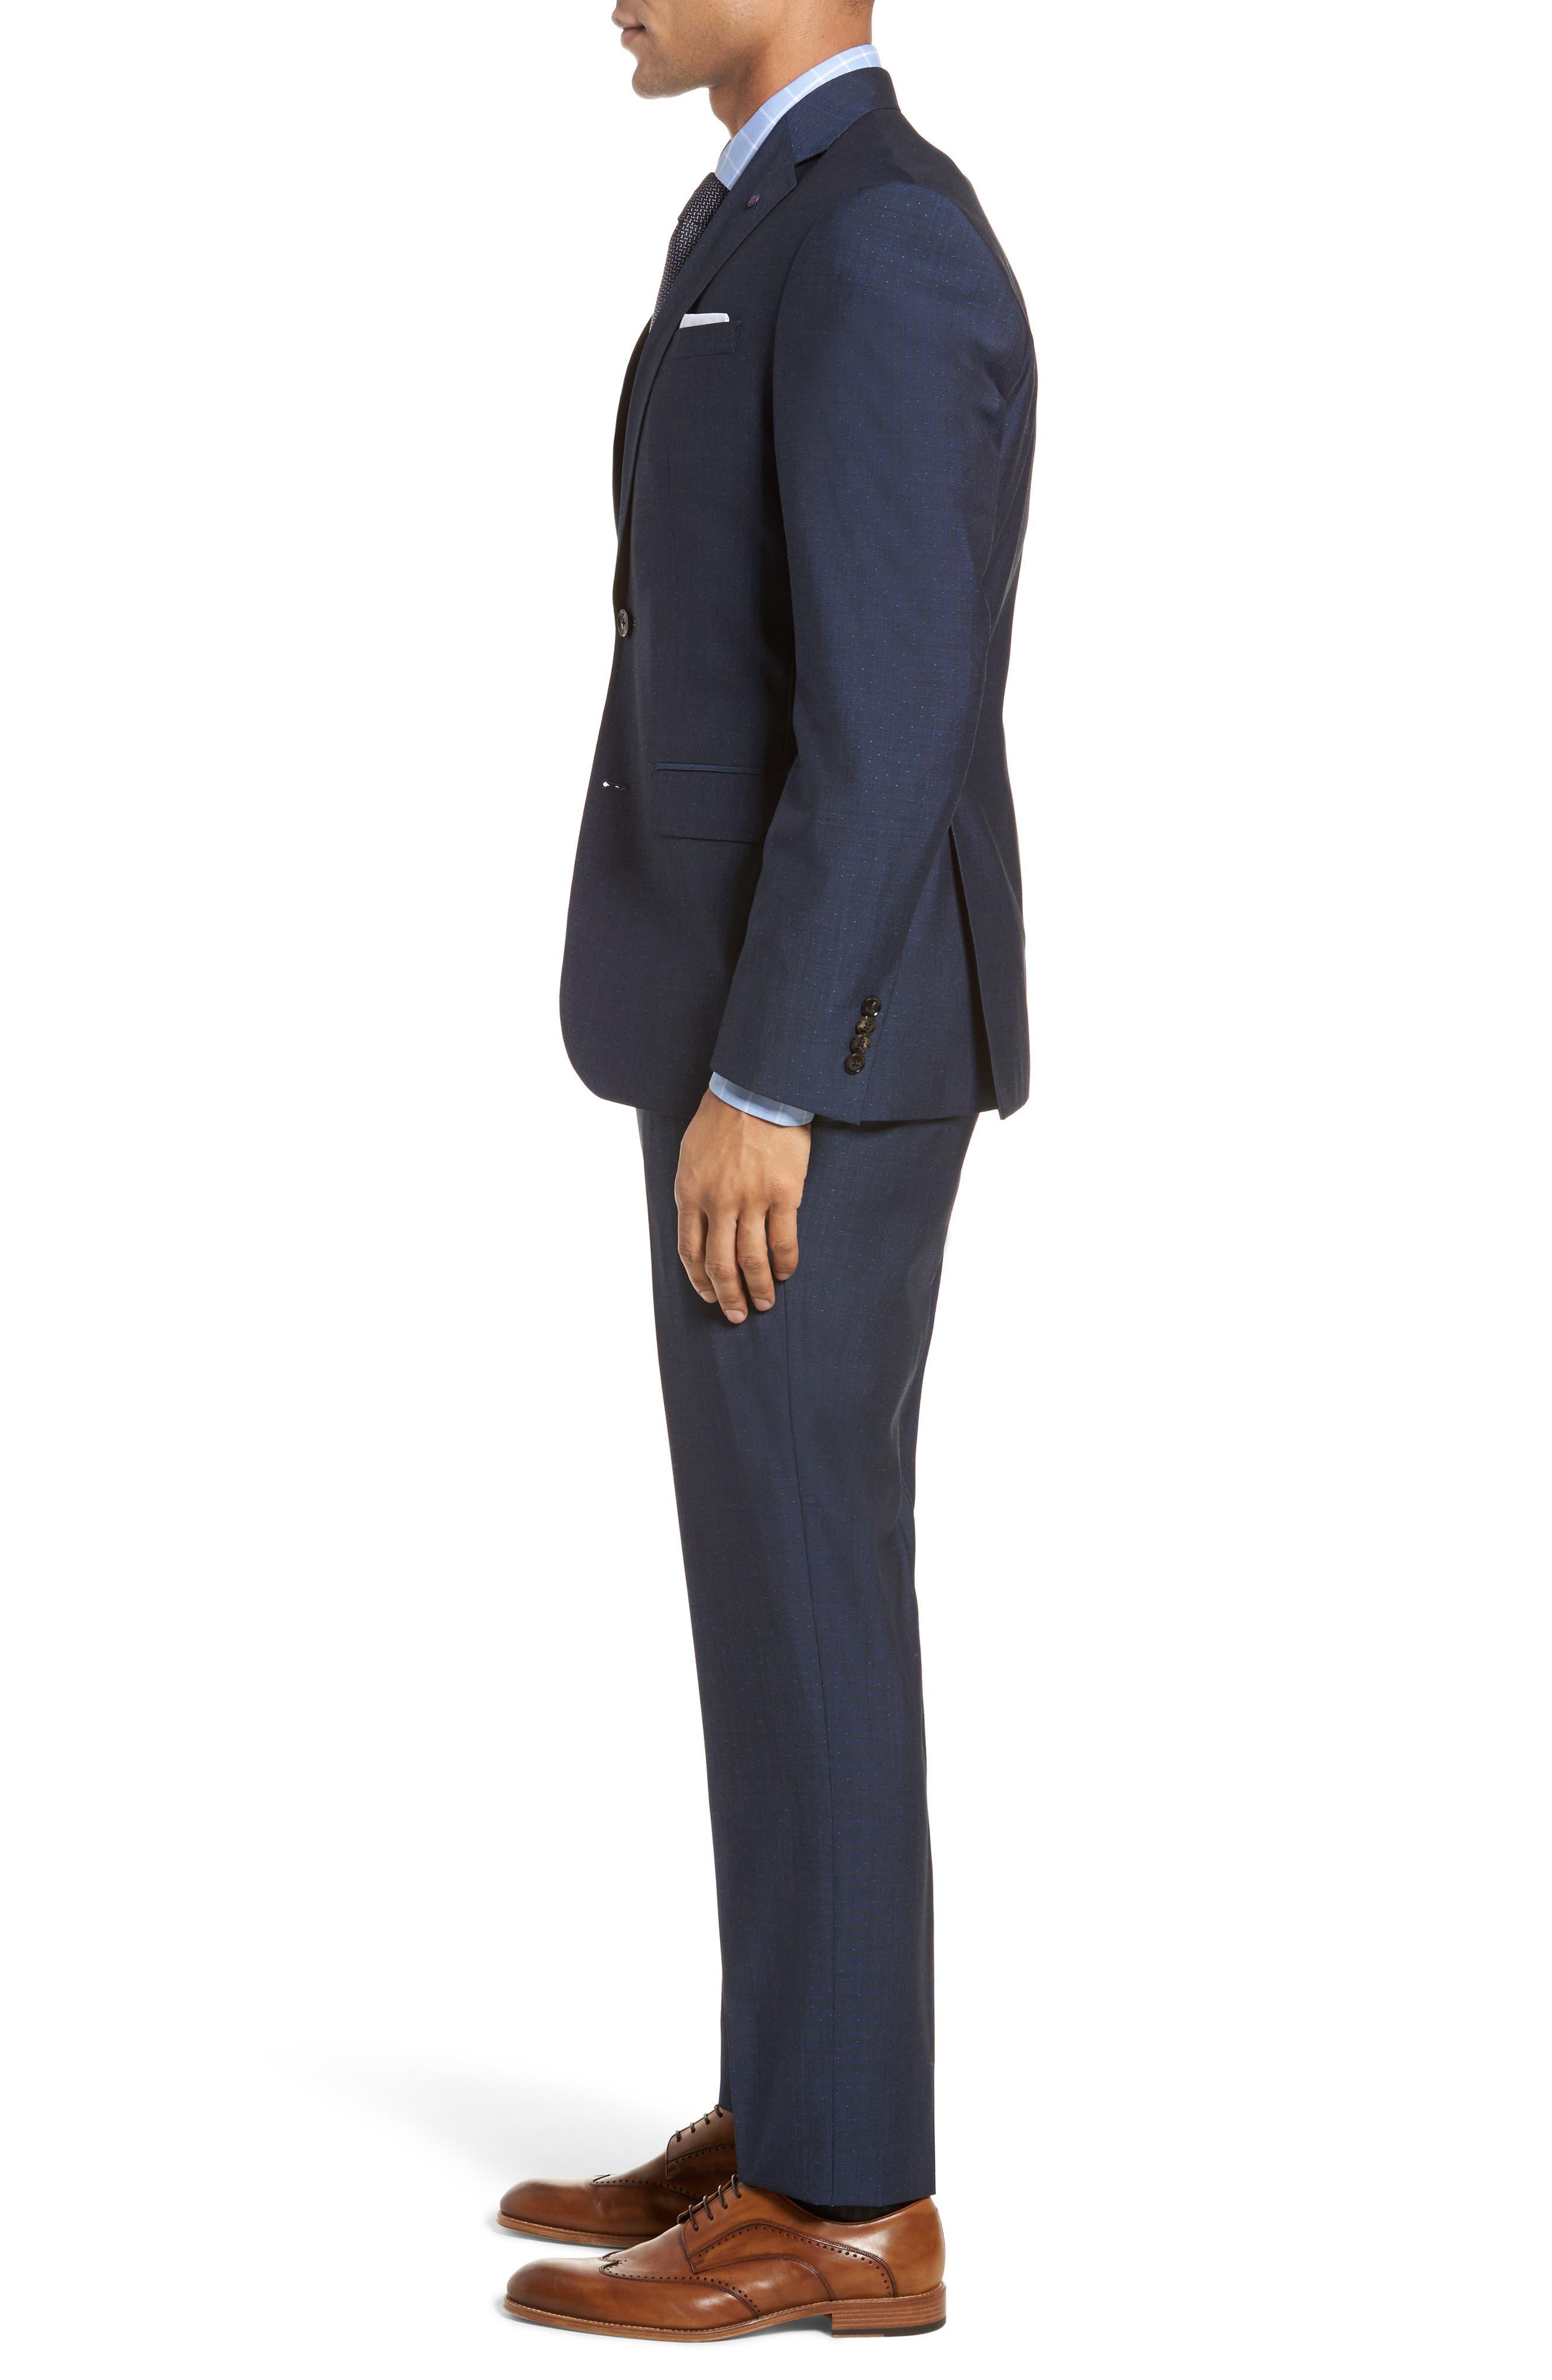 Roger Extra Slim Fit Dot Wool Suit,                             Alternate thumbnail 3, color,                             Dark Blue